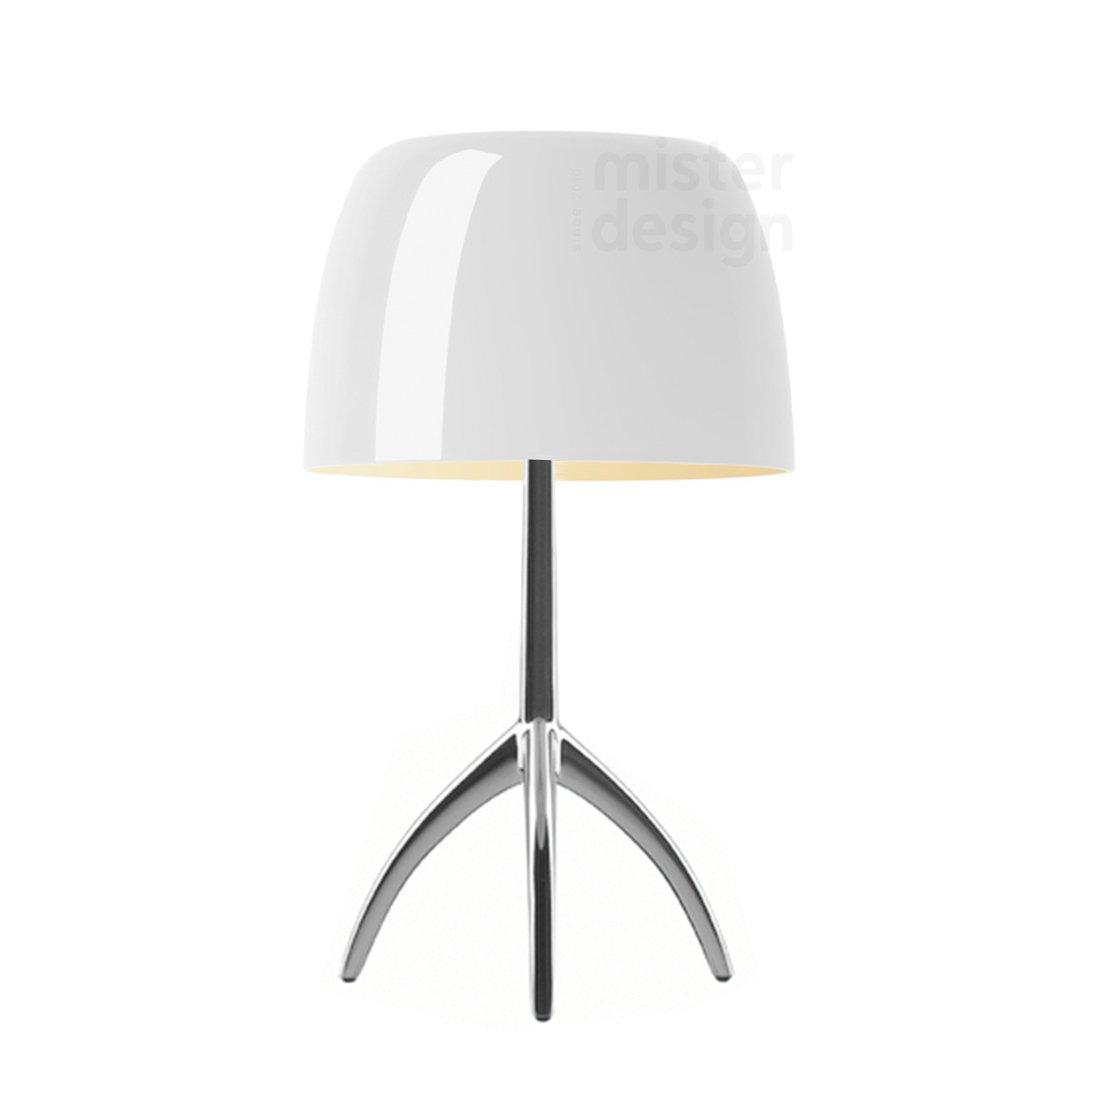 Foscarini Lumiere Piccola Tafellamp Dimbaar - Warm Wit - Aluminium